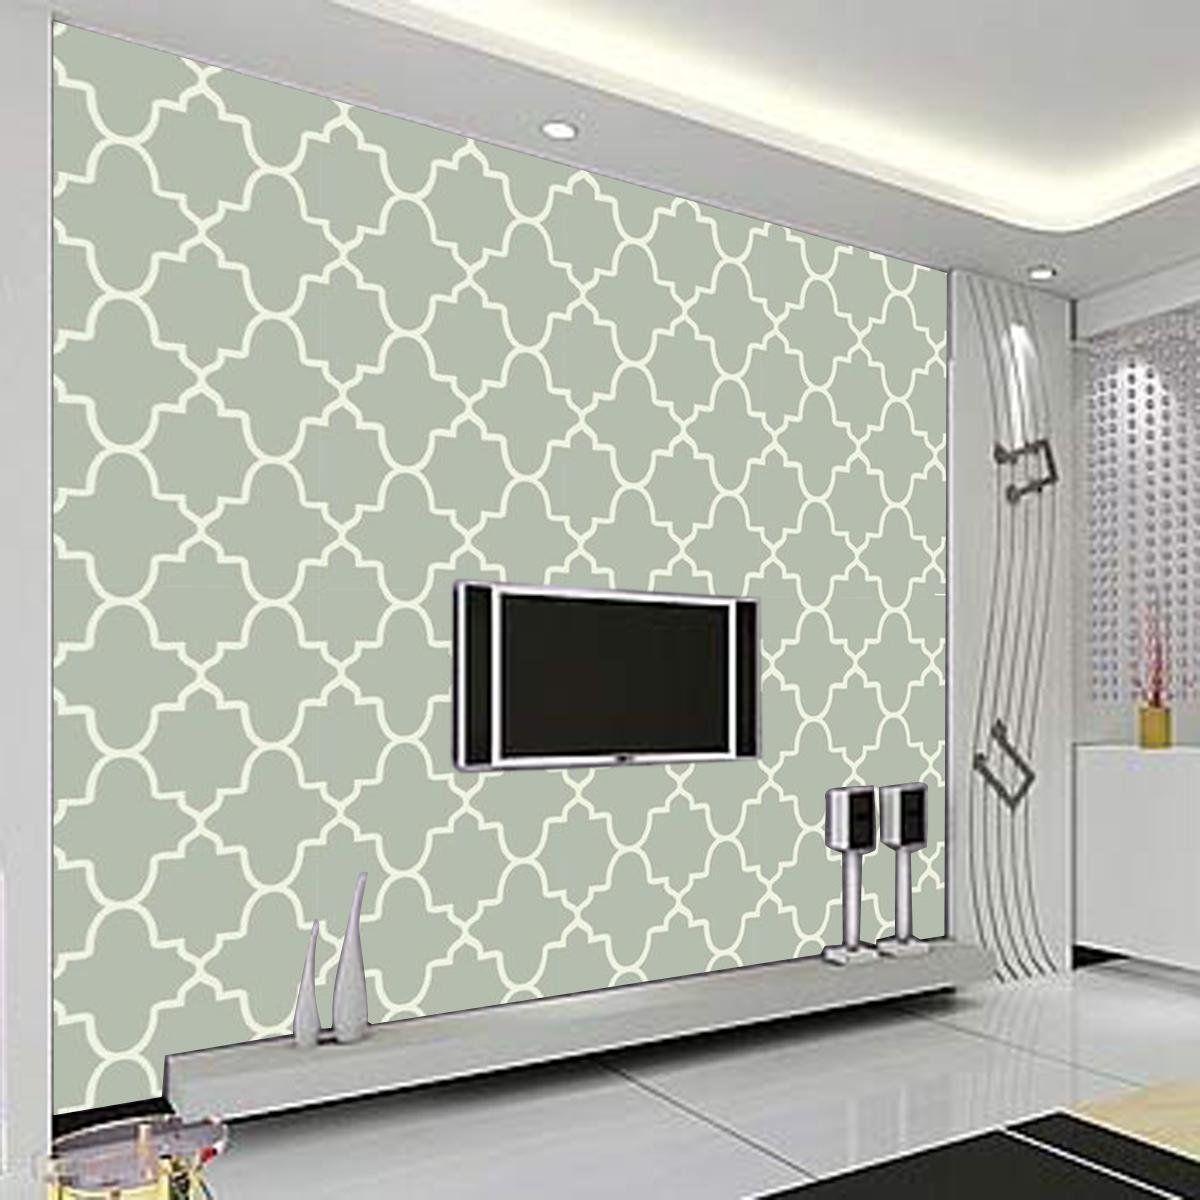 Amazon design trellis pattern allover wall stencil reusable amazon design trellis pattern allover wall stencil reusable template diy rooms furniture wallpaper amipublicfo Gallery